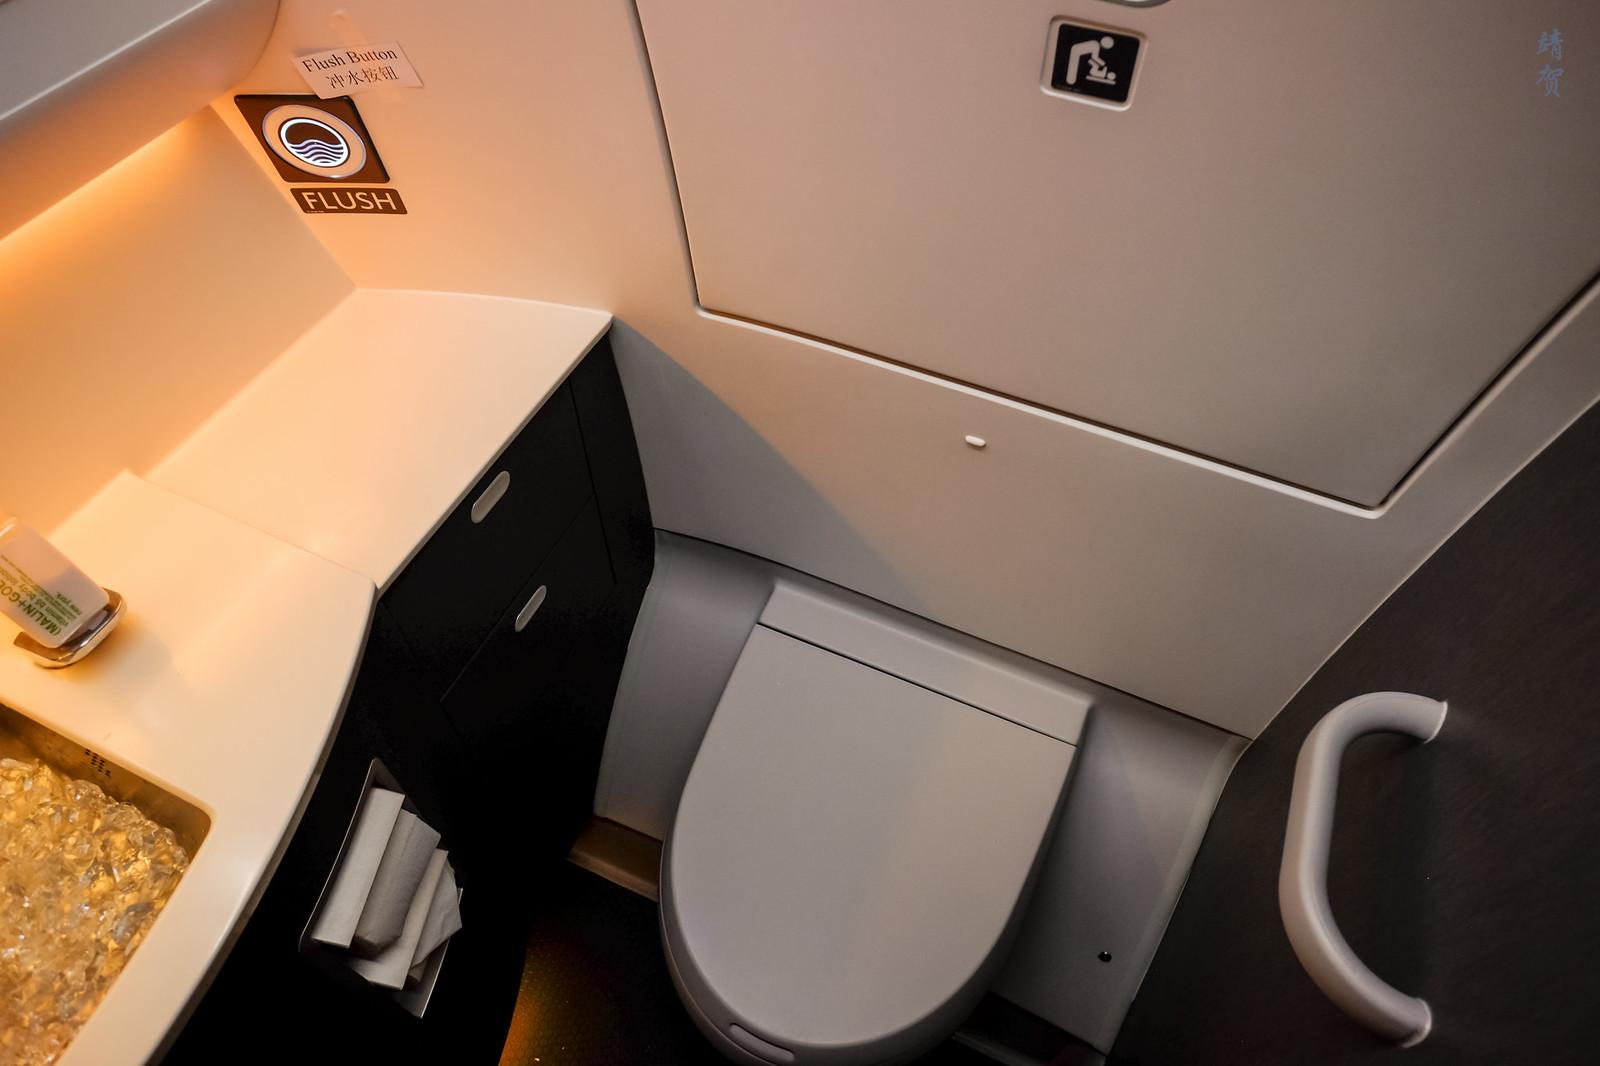 Inside the lavatory